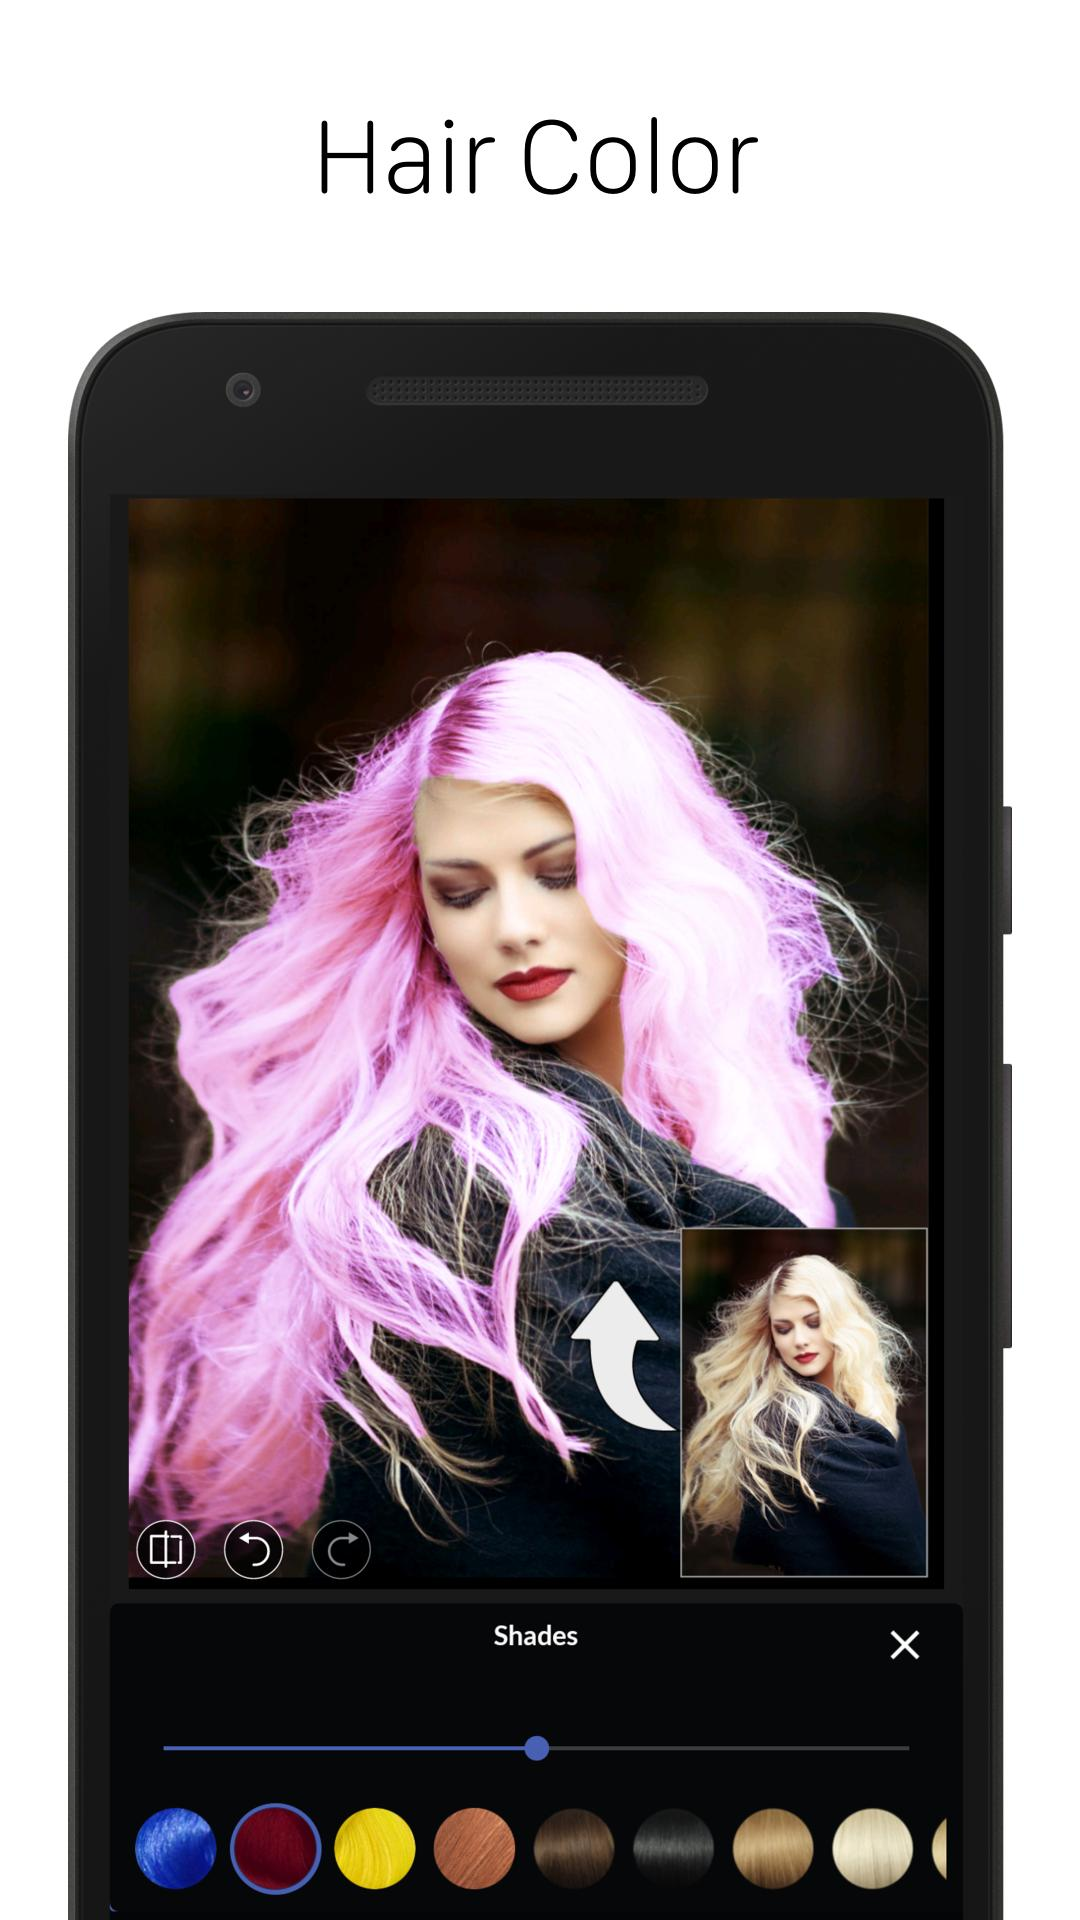 LightX Photo Editor & Photo Effects 2.1.0 Screenshot 5